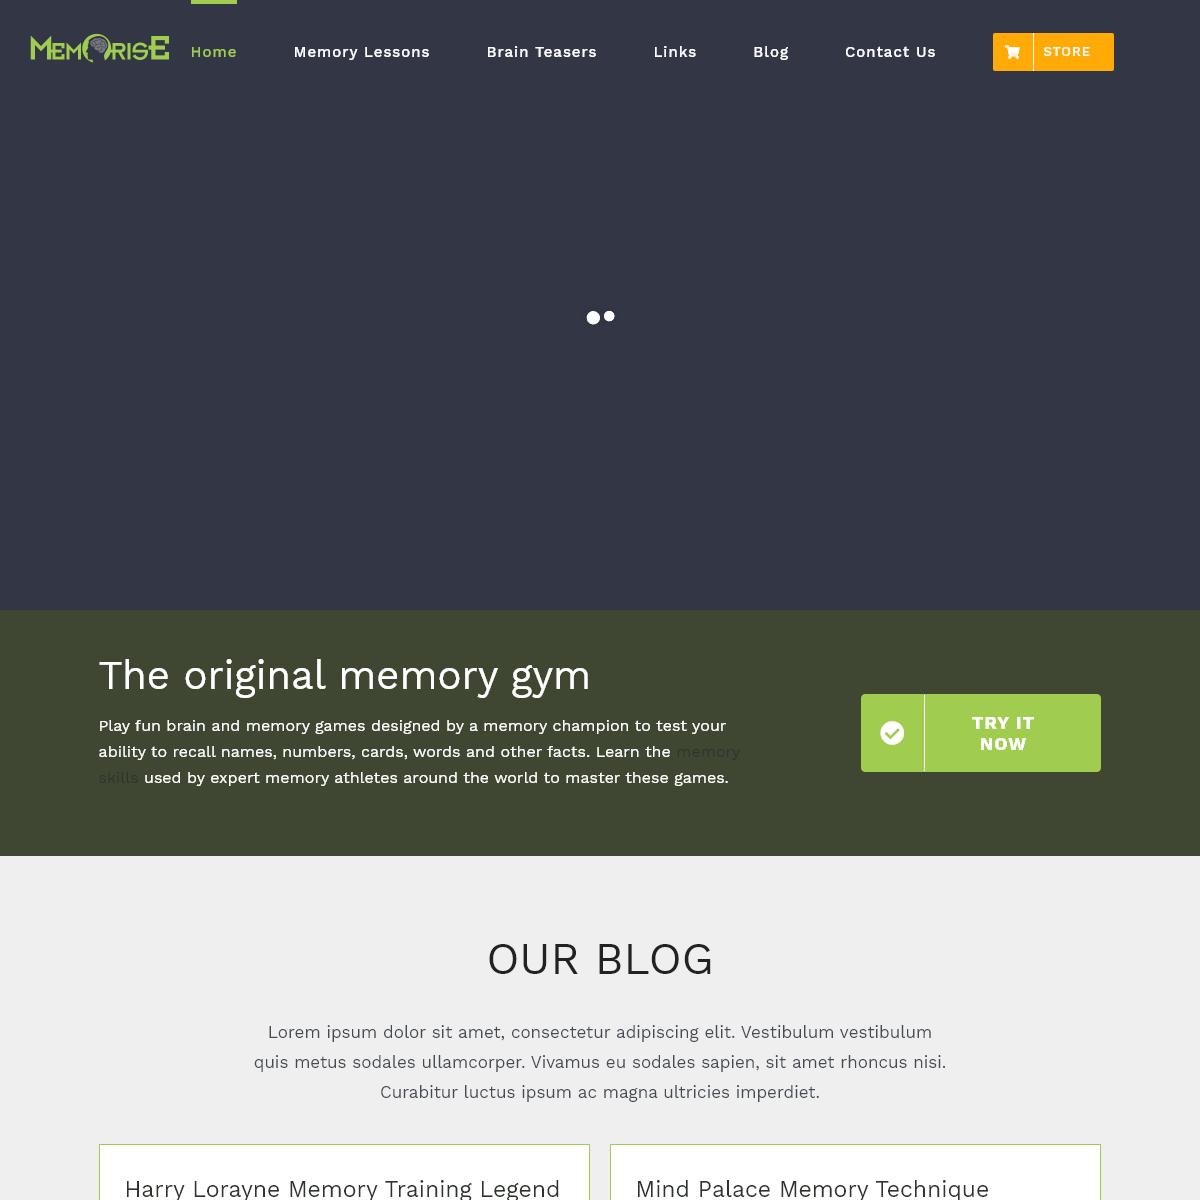 Professional Memory Recall Training Games & Videos - Memorise